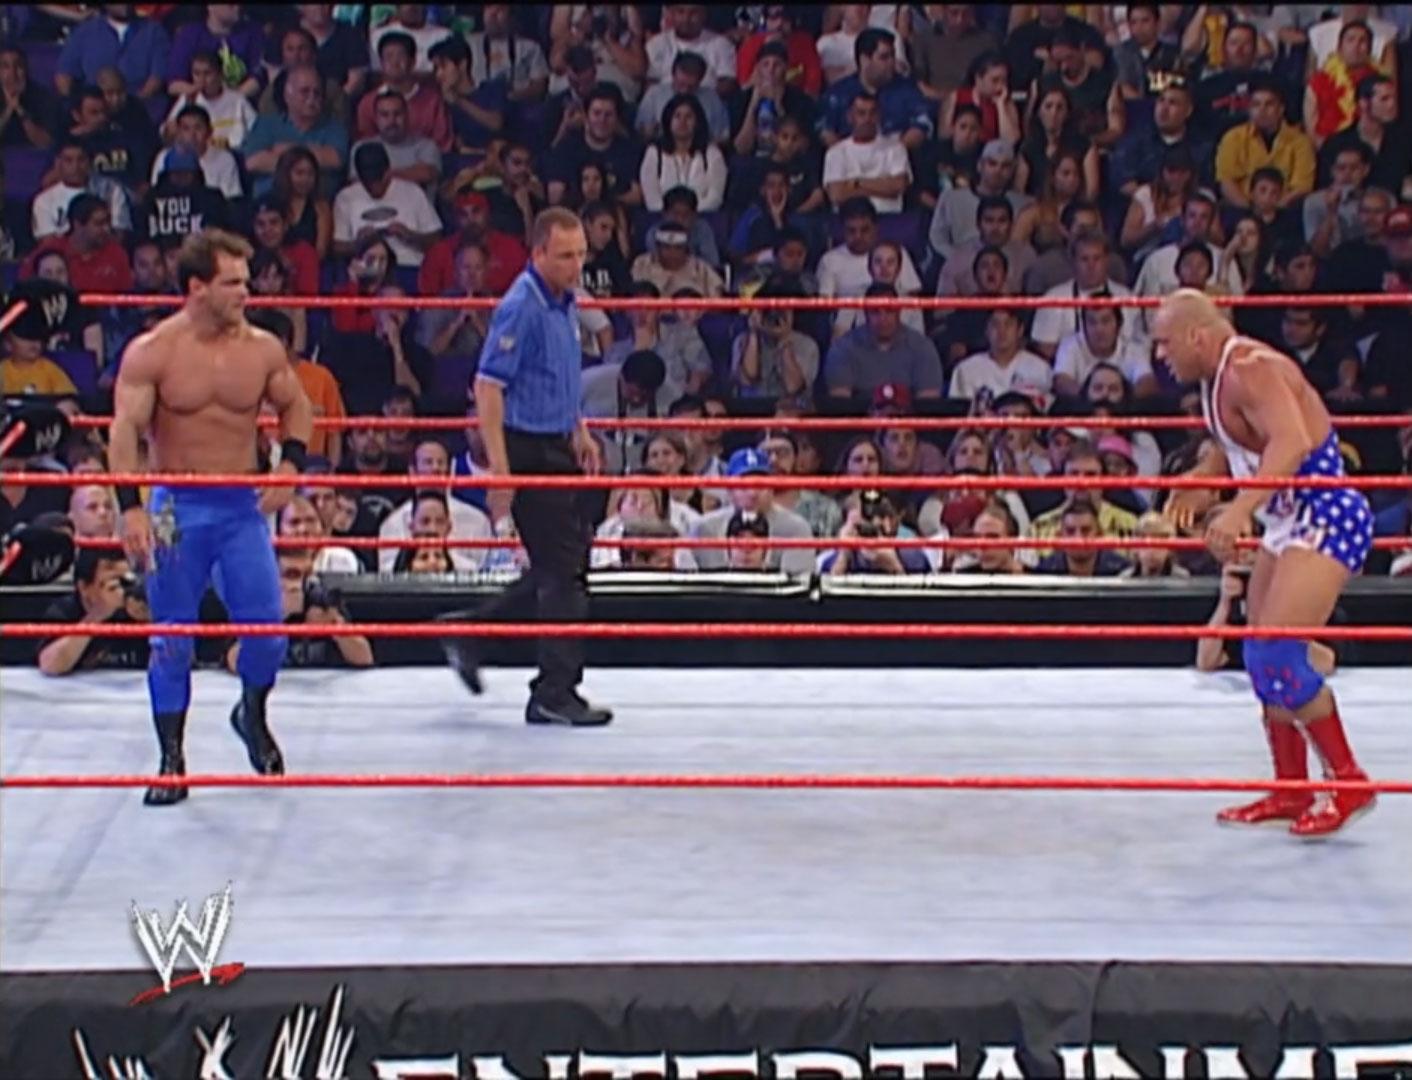 Chris Benoit vs. Kurt Angle WWE Unforgiven '02, Sep 22nd 2002